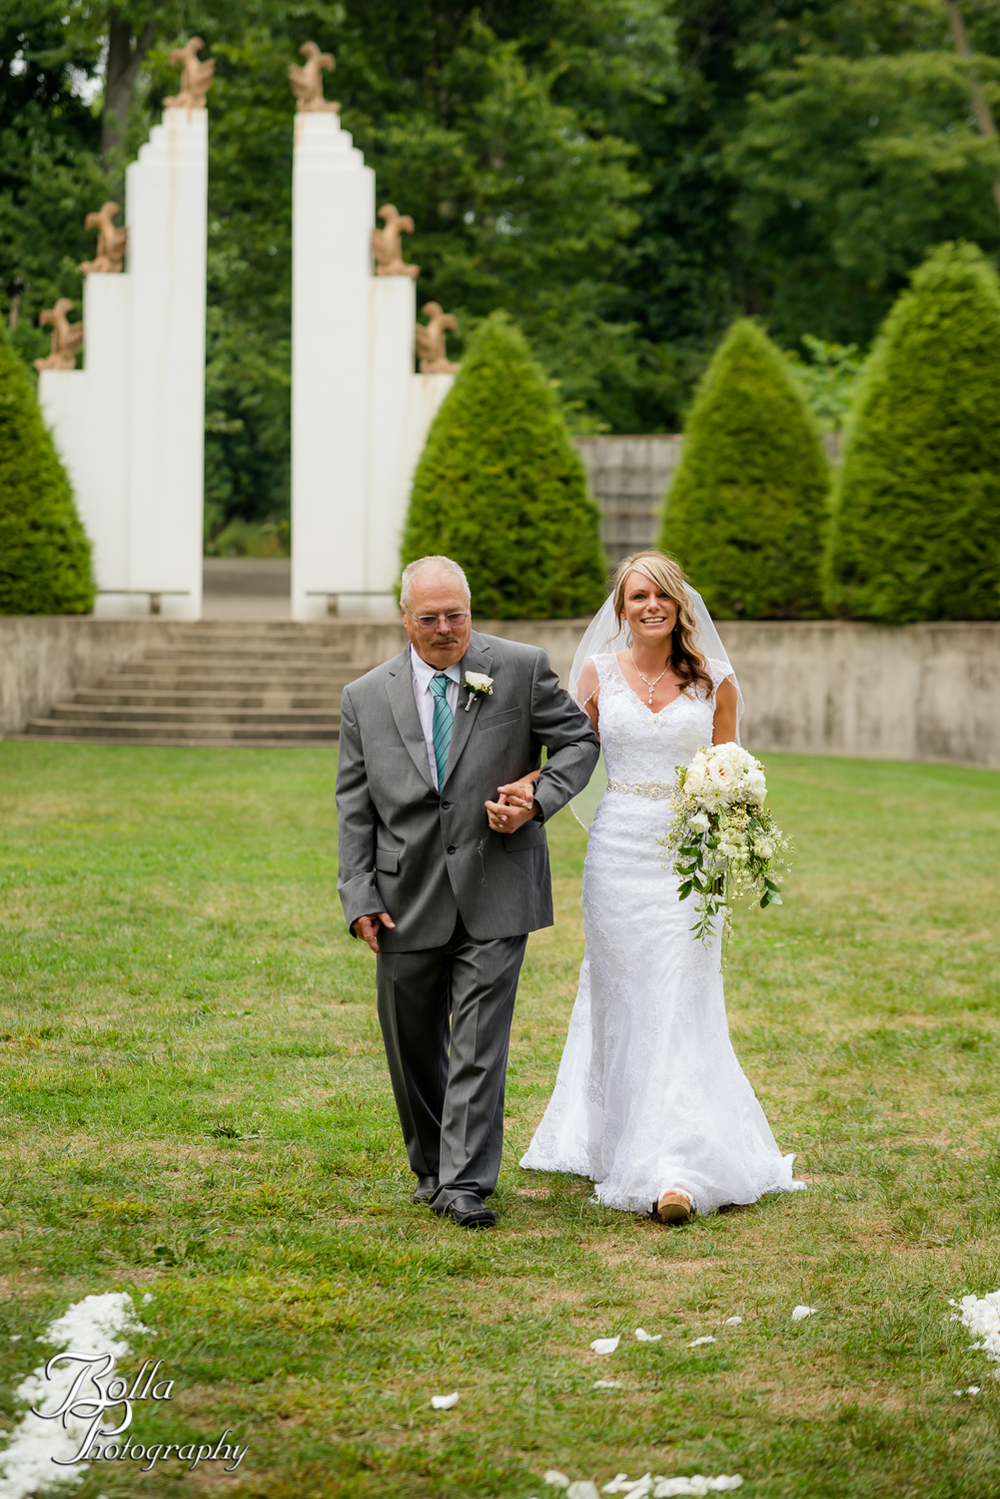 Bolla_Photography_St_Louis_wedding_photographer-0228.jpg